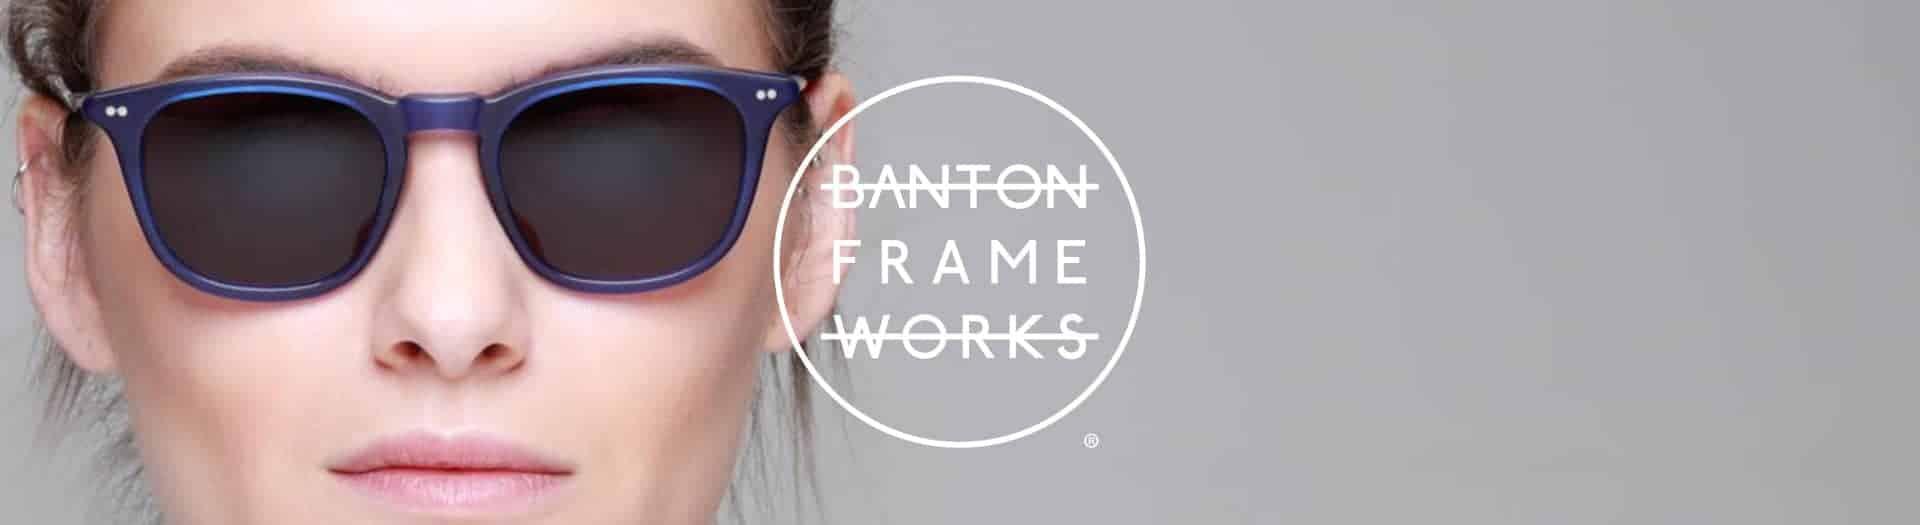 Banton Frameworks British Made Sunglasses Header